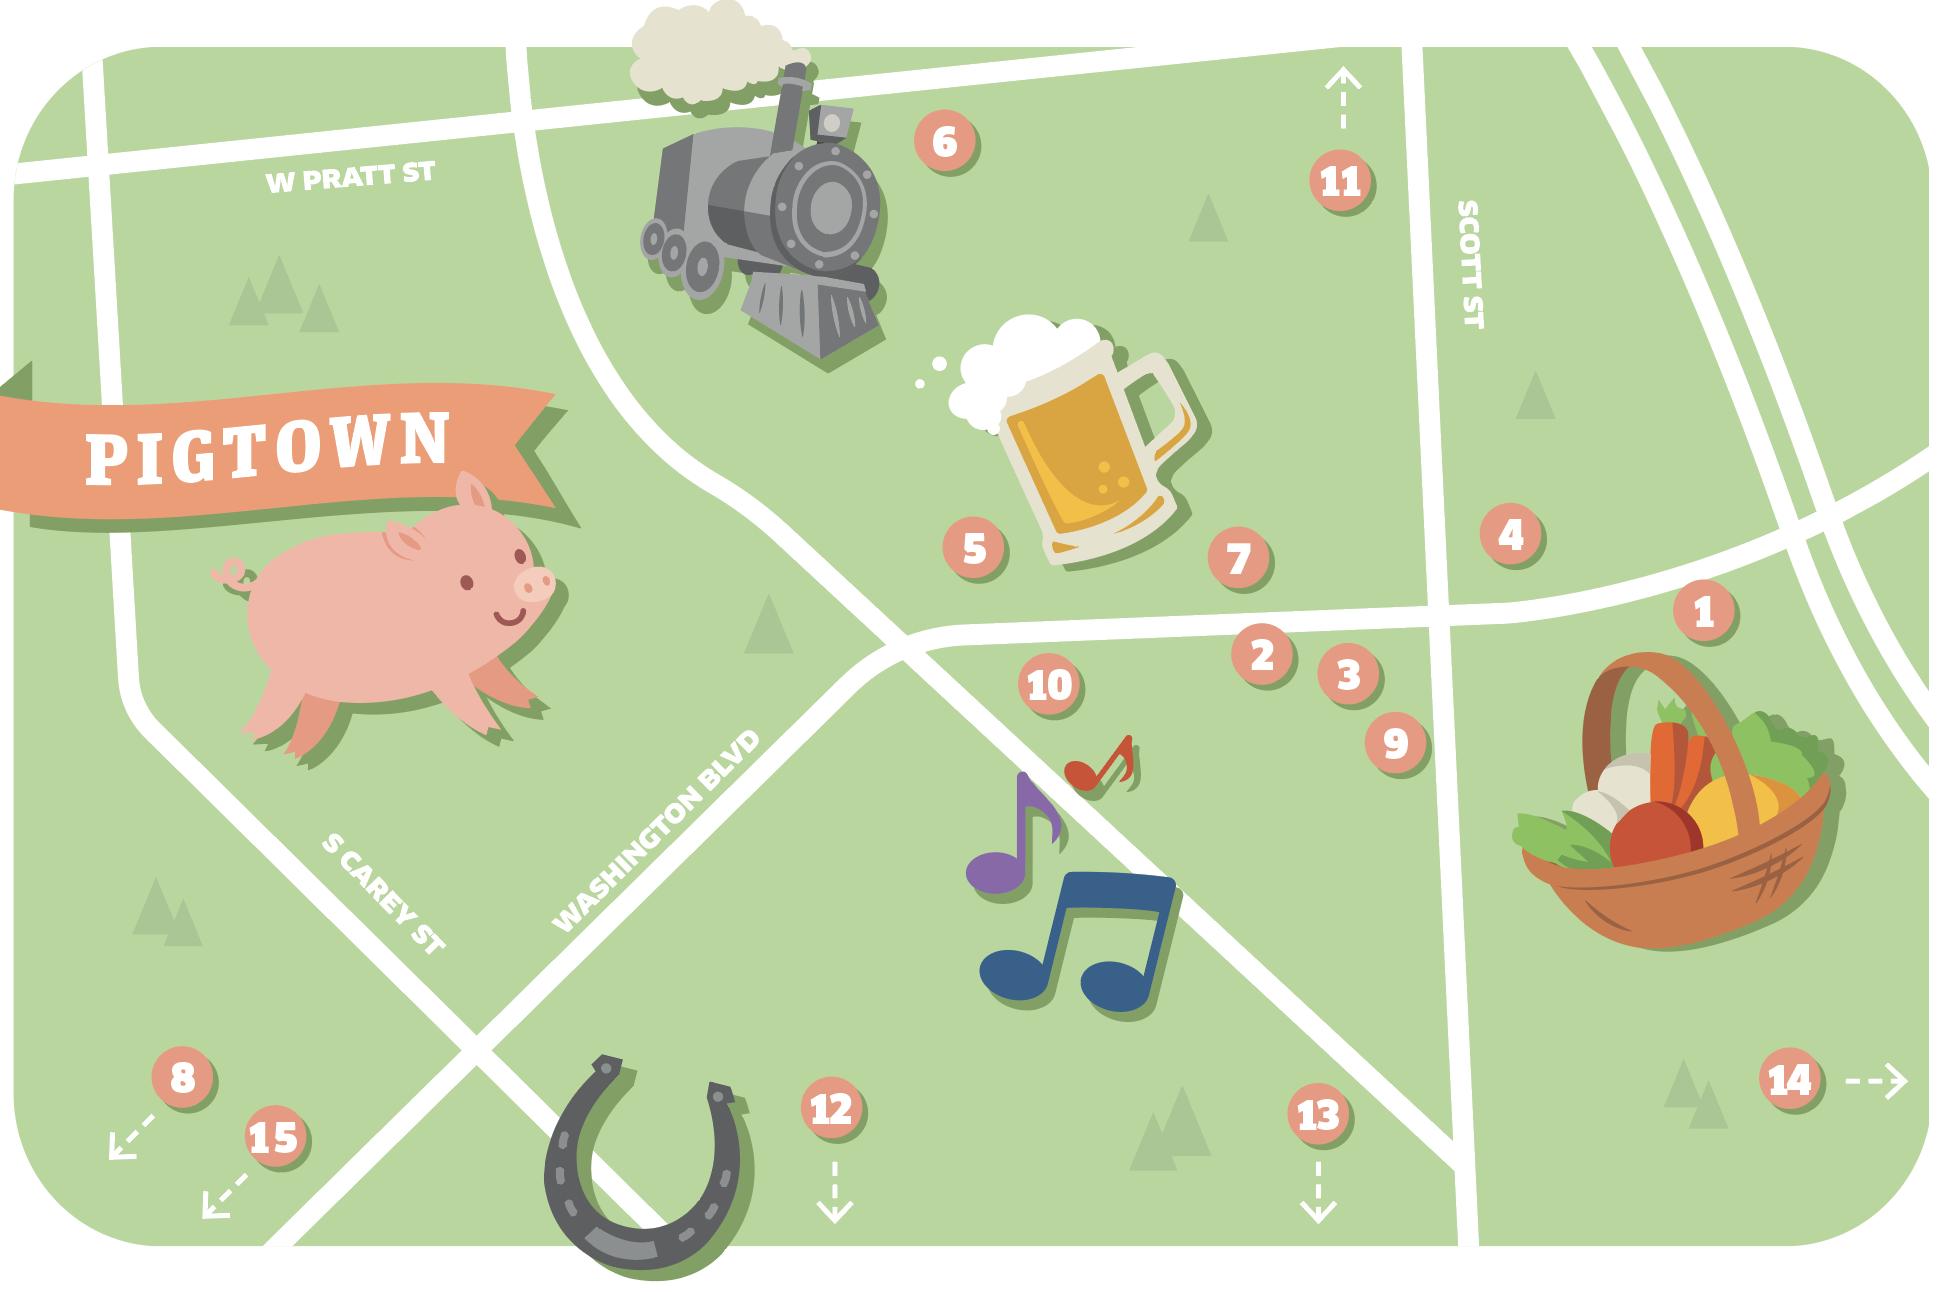 Pigtown map hero 2